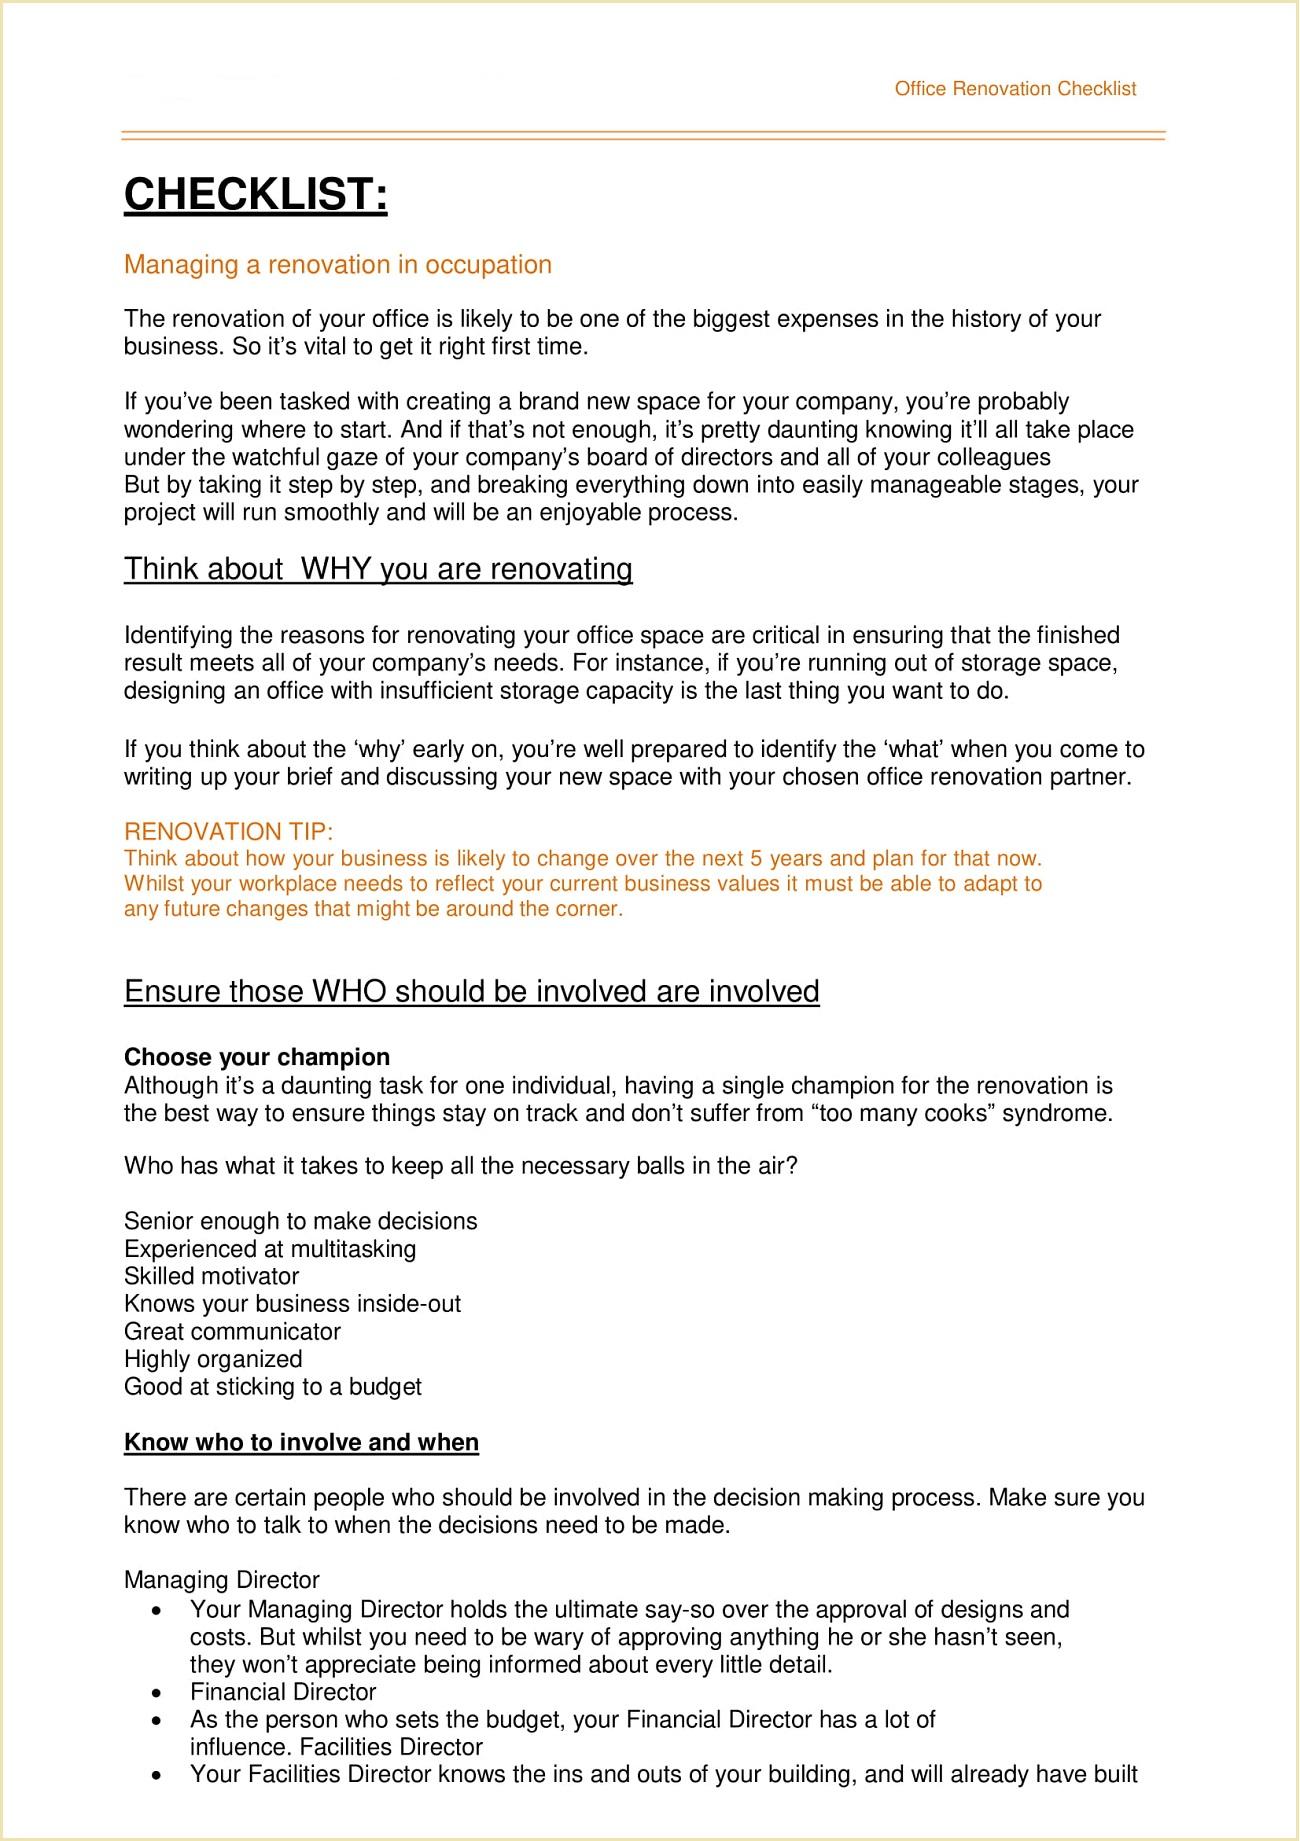 Office Renovation Checklist Template PDF